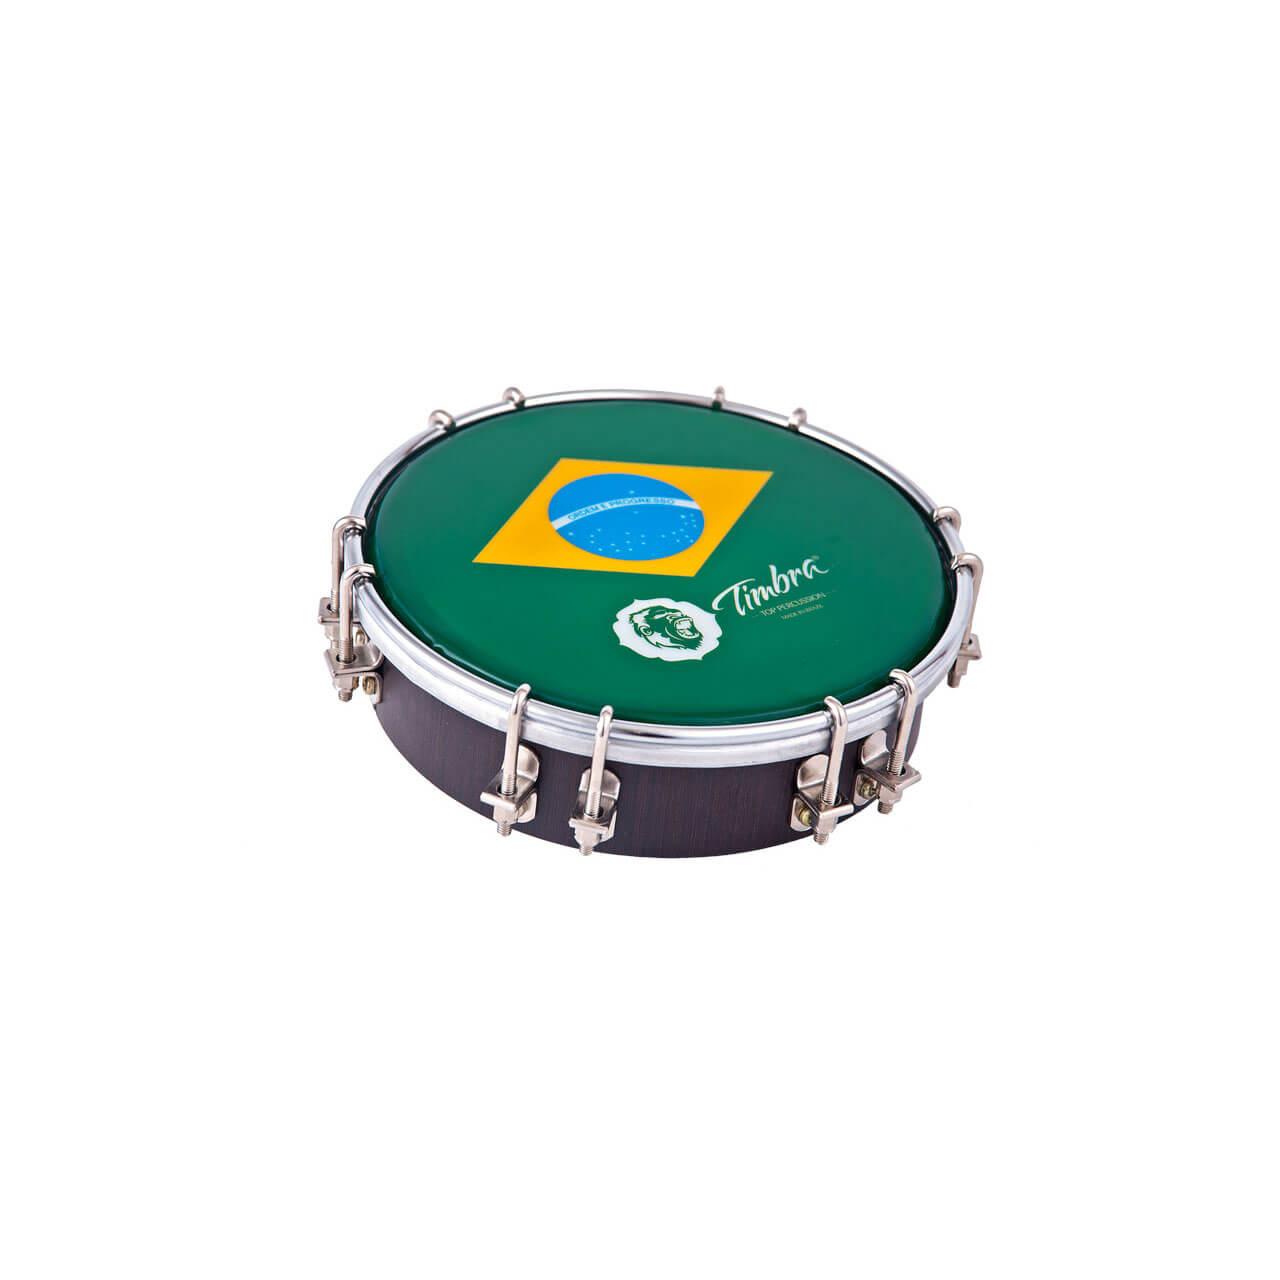 Tamborim 06 Pol Madeira C/aro Cromado 12 Afinadores Pele Brasil P3 Timbra